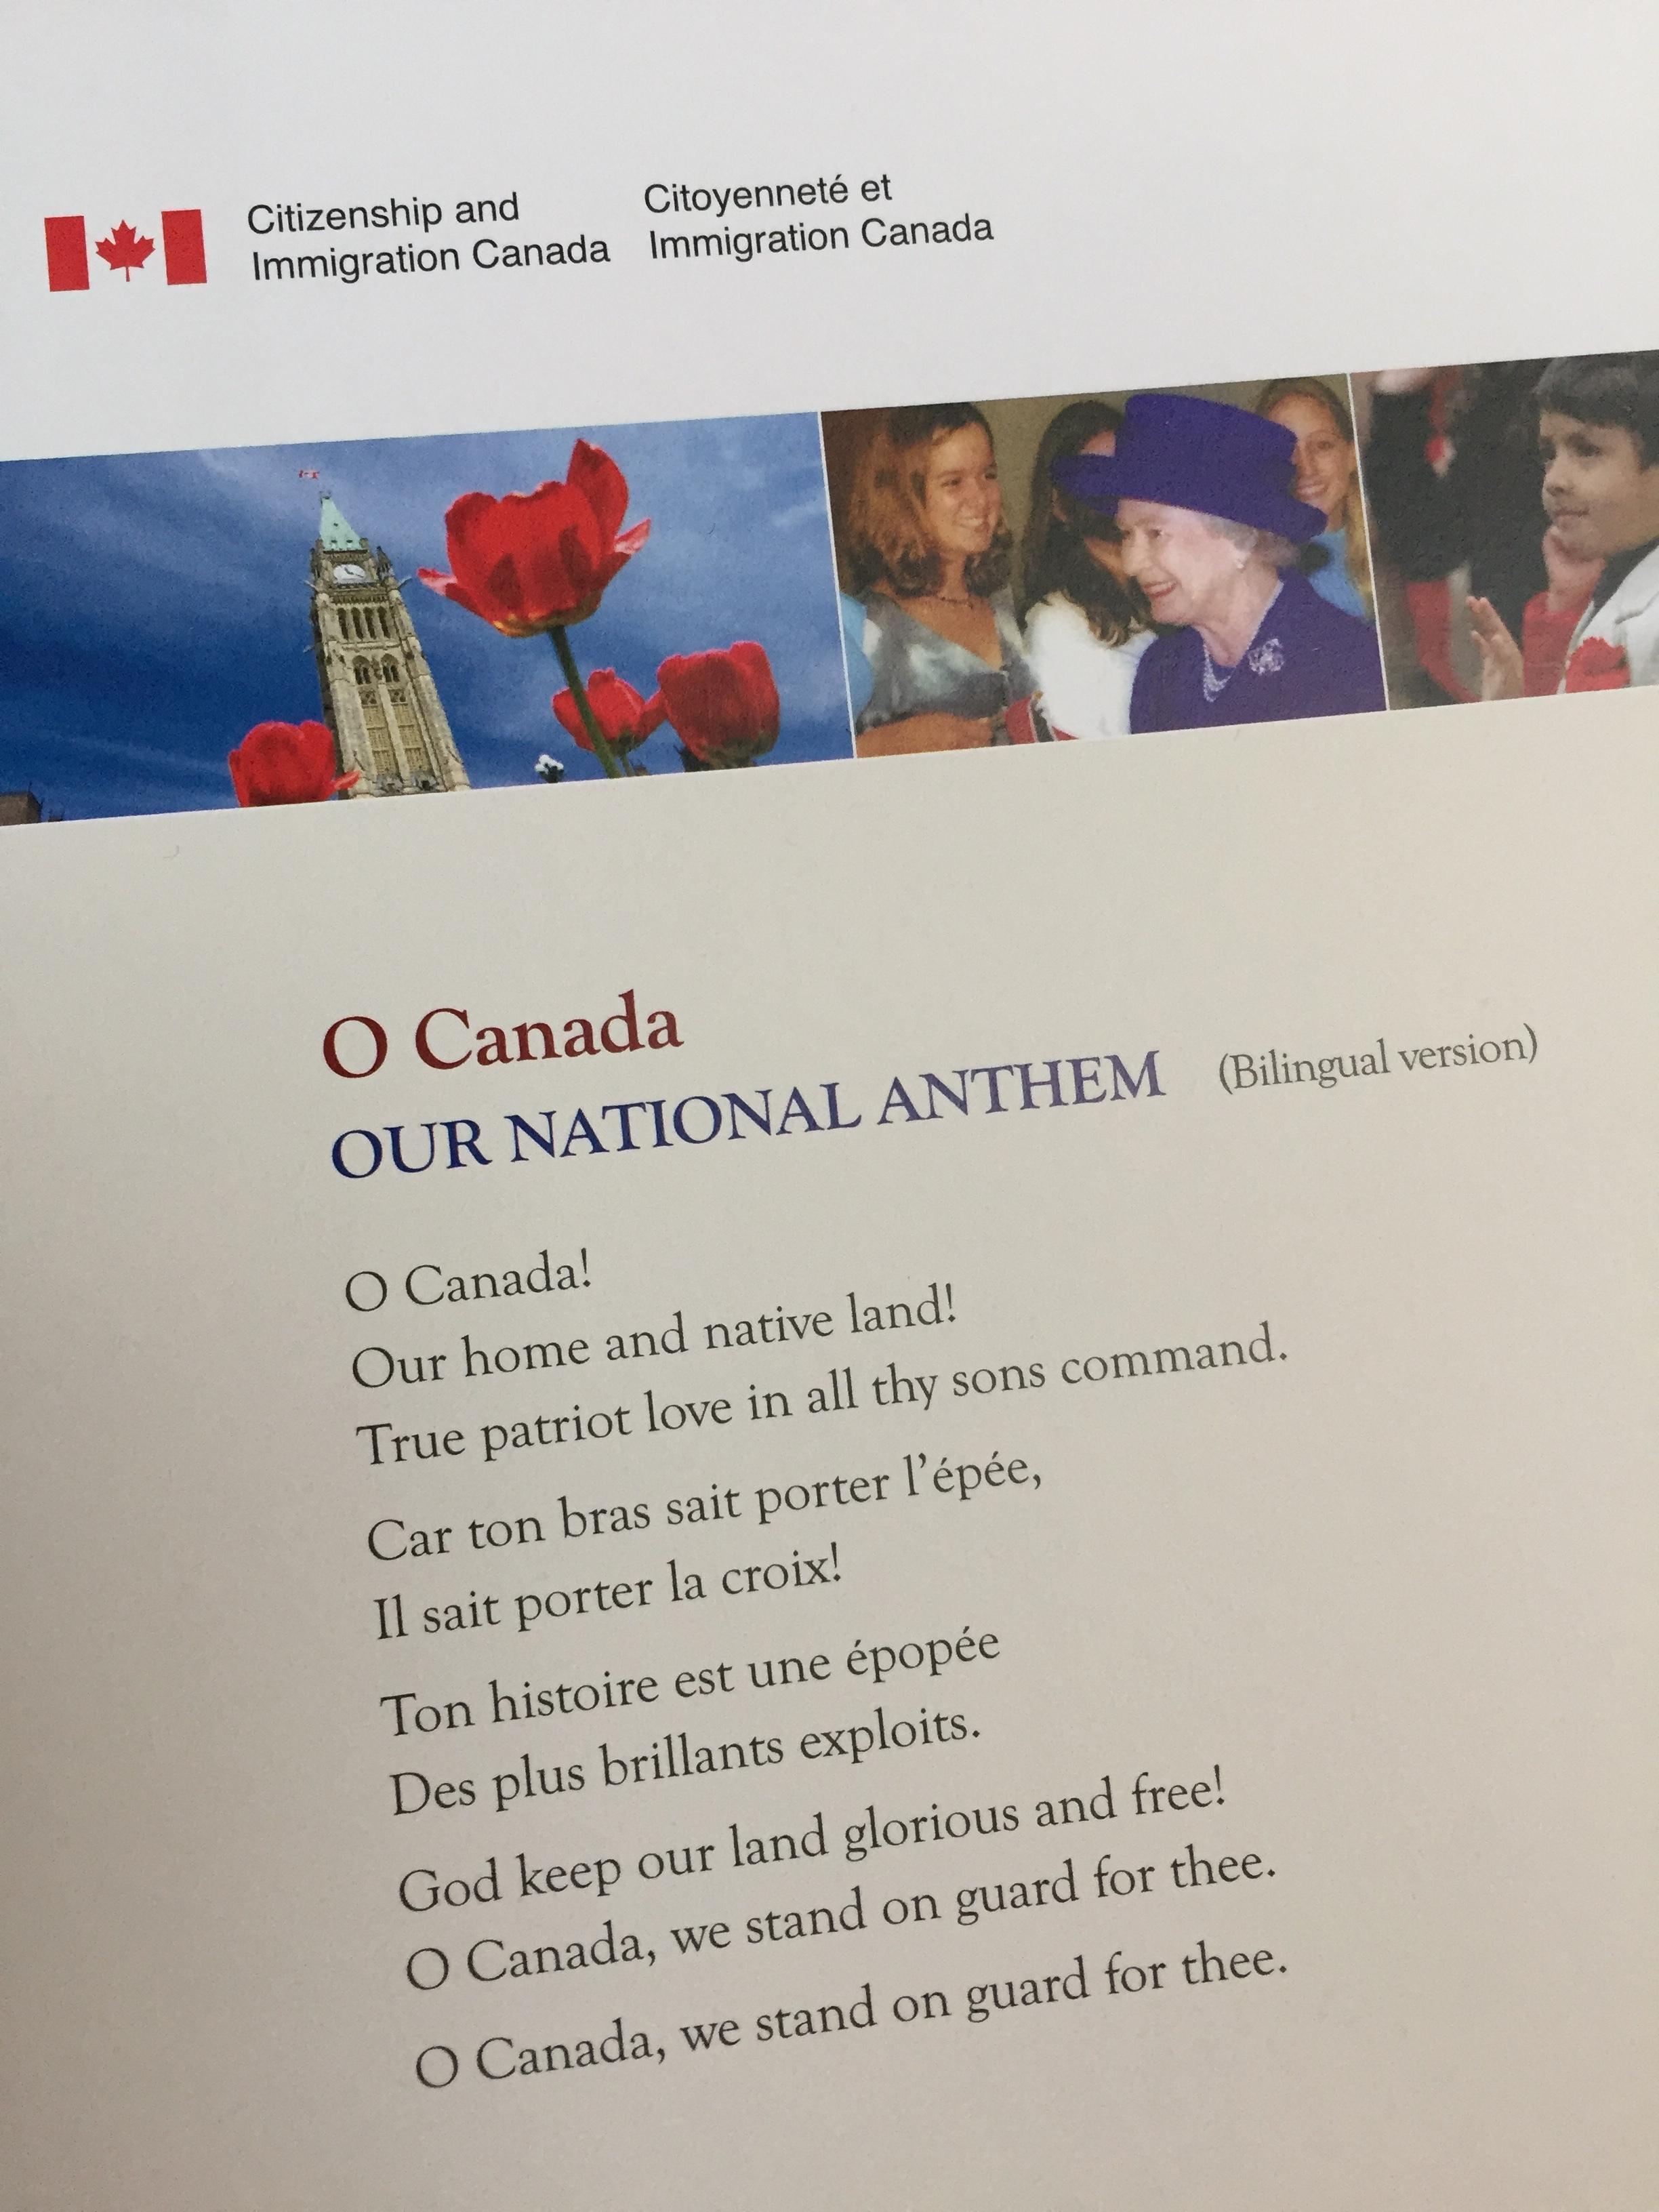 Canada's national anthem